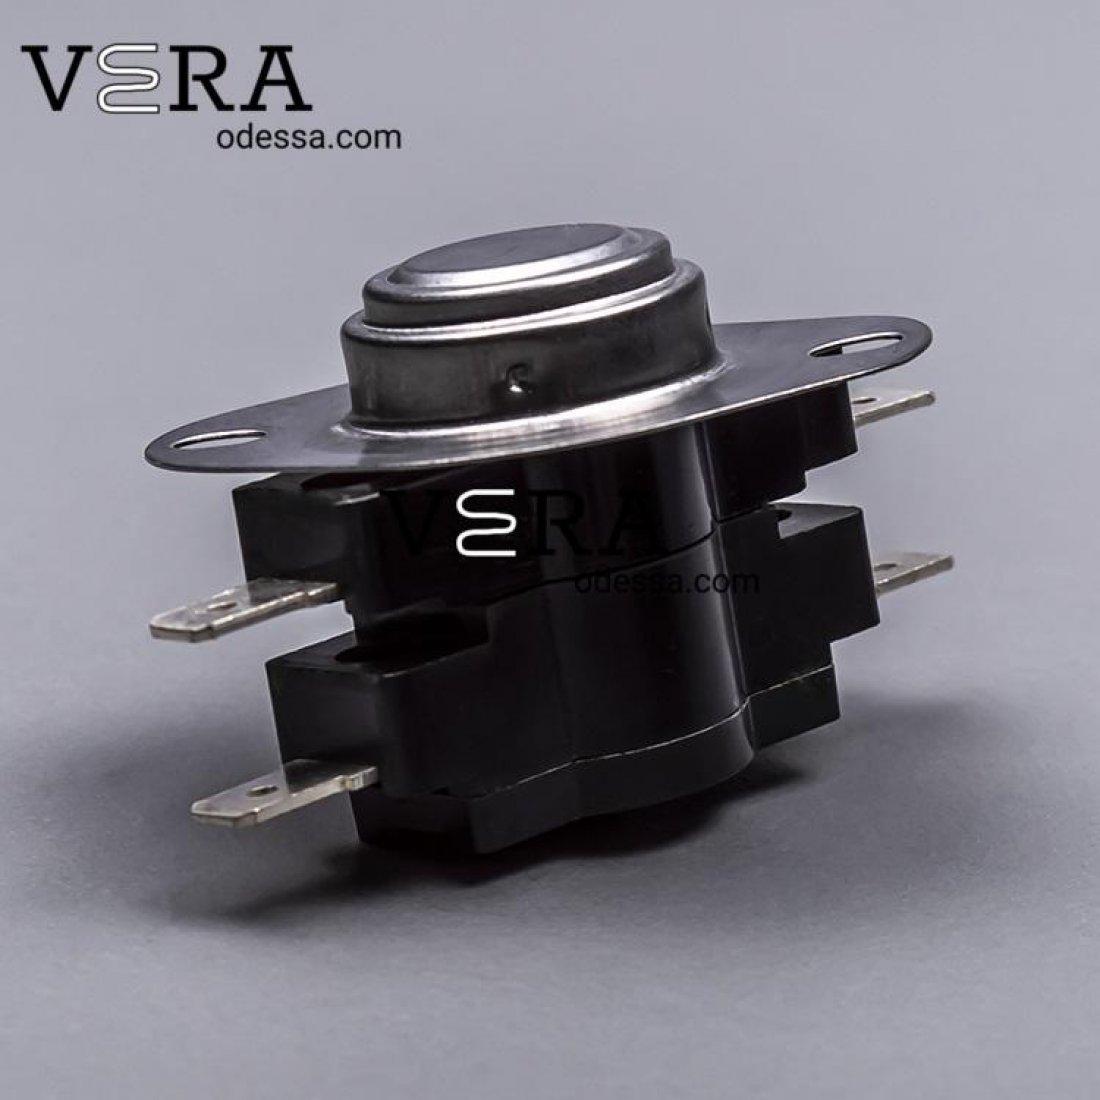 Купить термореле KSD-301 C 90°- 16 А Gorenje оптом, фотография 2